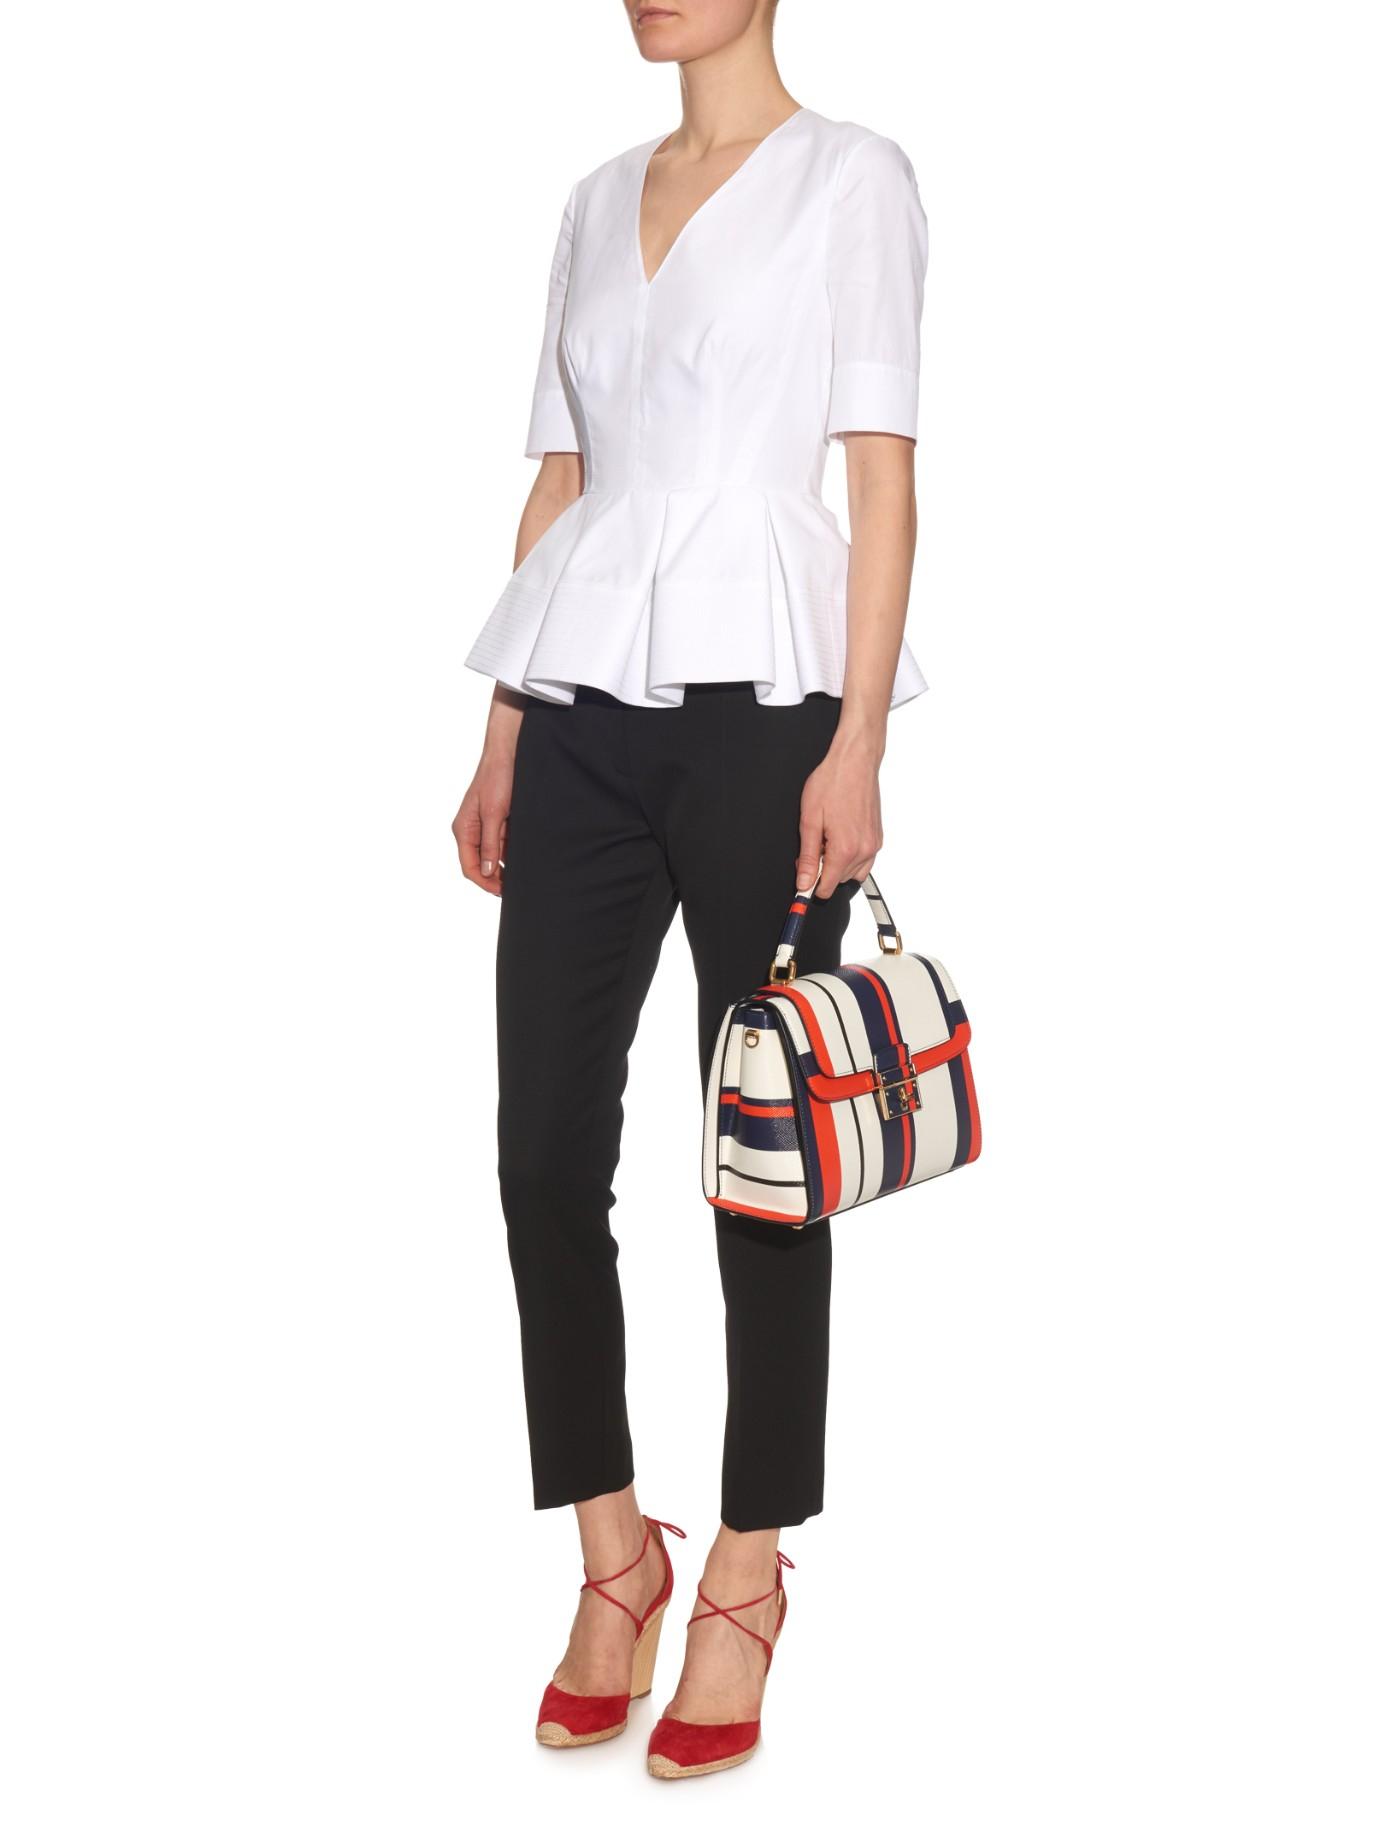 Lyst - Dolce   Gabbana Greta Medium Striped-leather Tote in White 79c939565fbe0